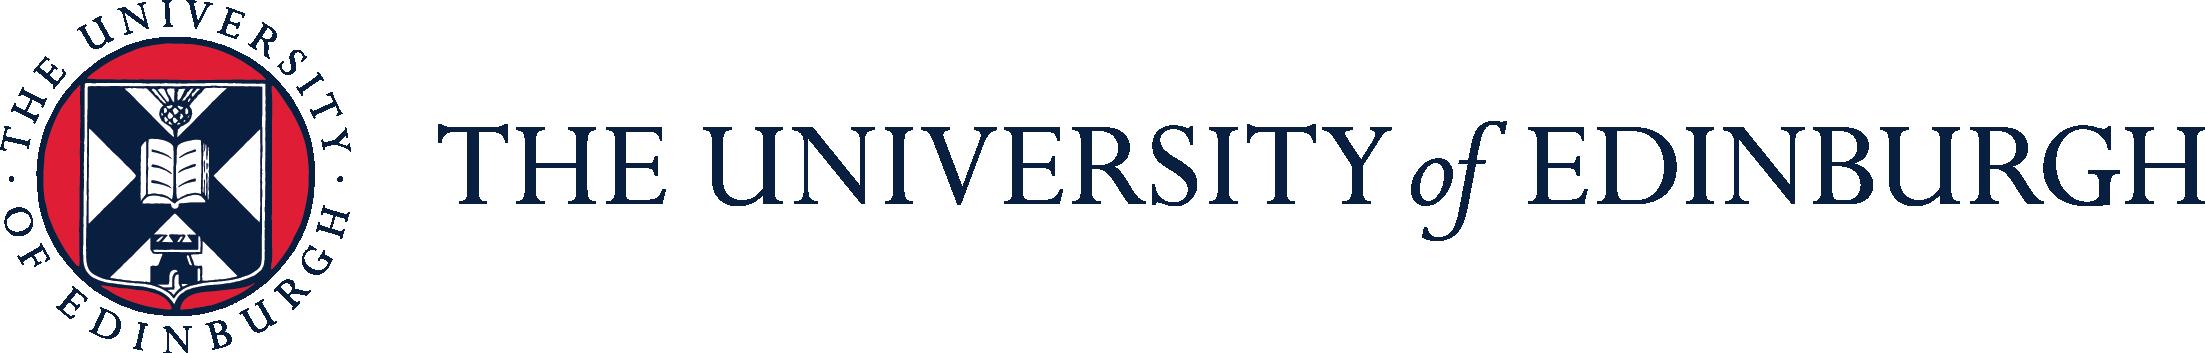 UoE_Horizontal Logo_CMYK_v1_160215.png